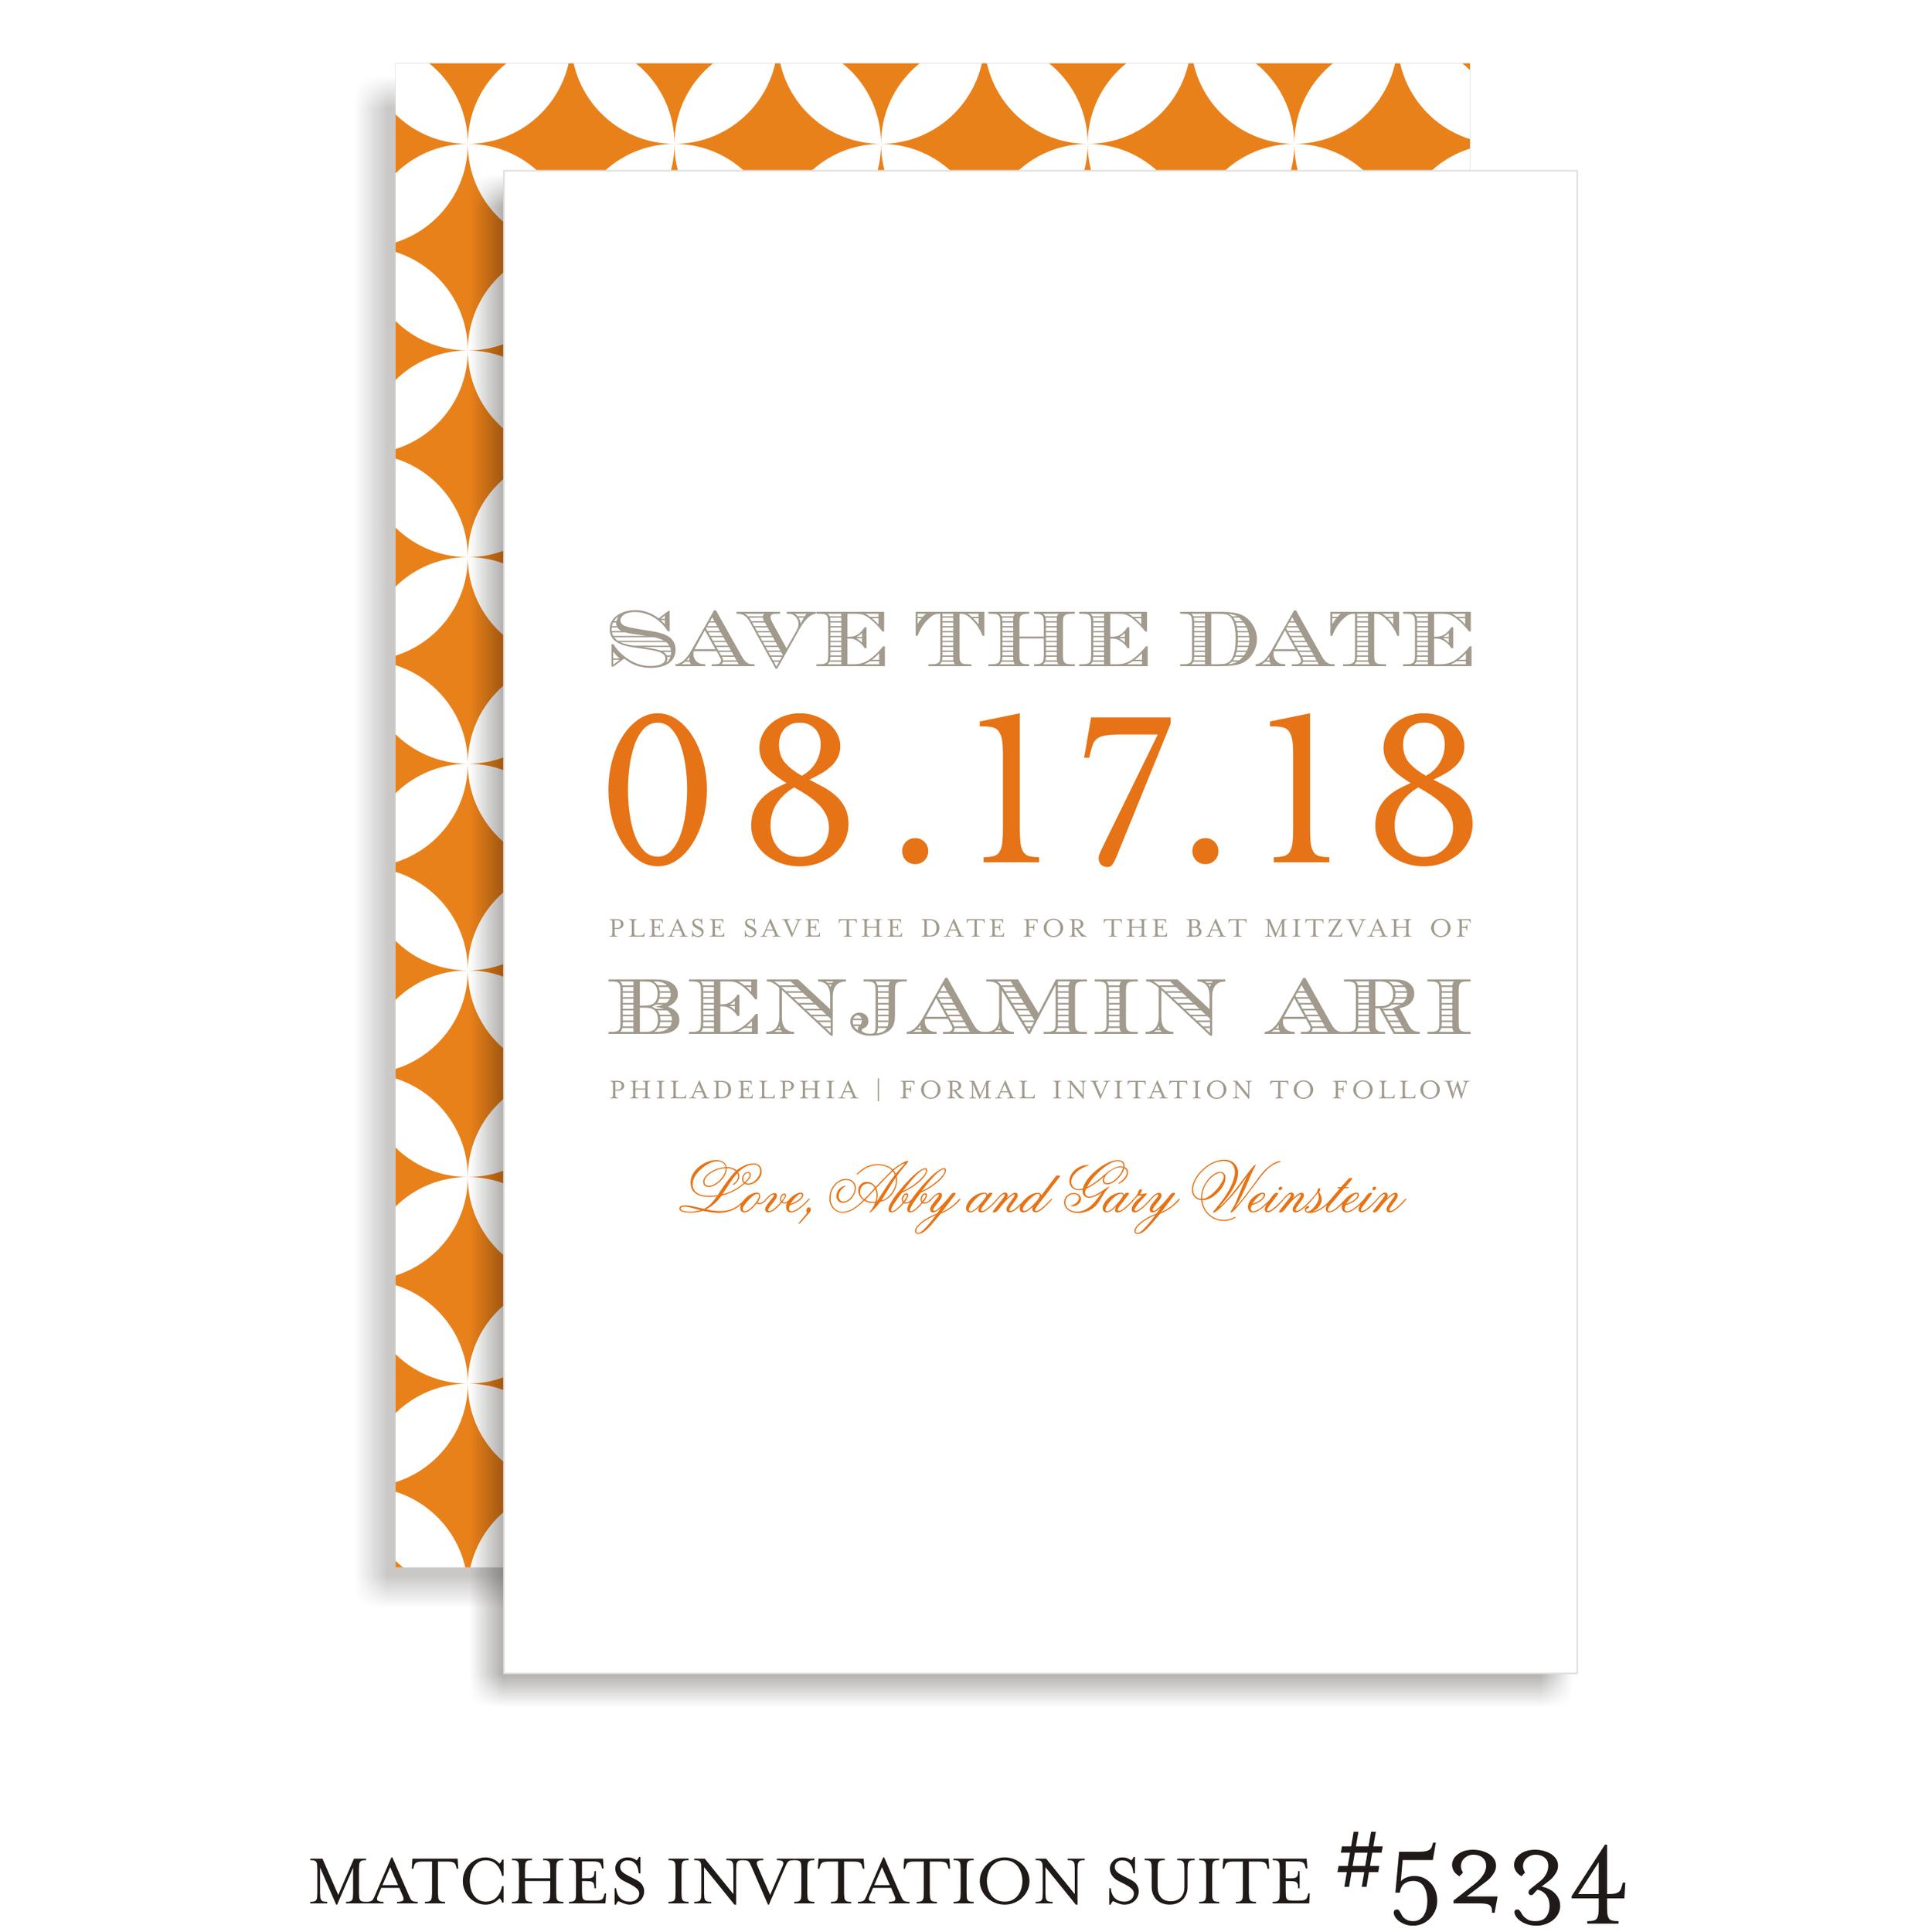 Save the Date Bar Mitzvah Suite 5234 - Benjamin Ari